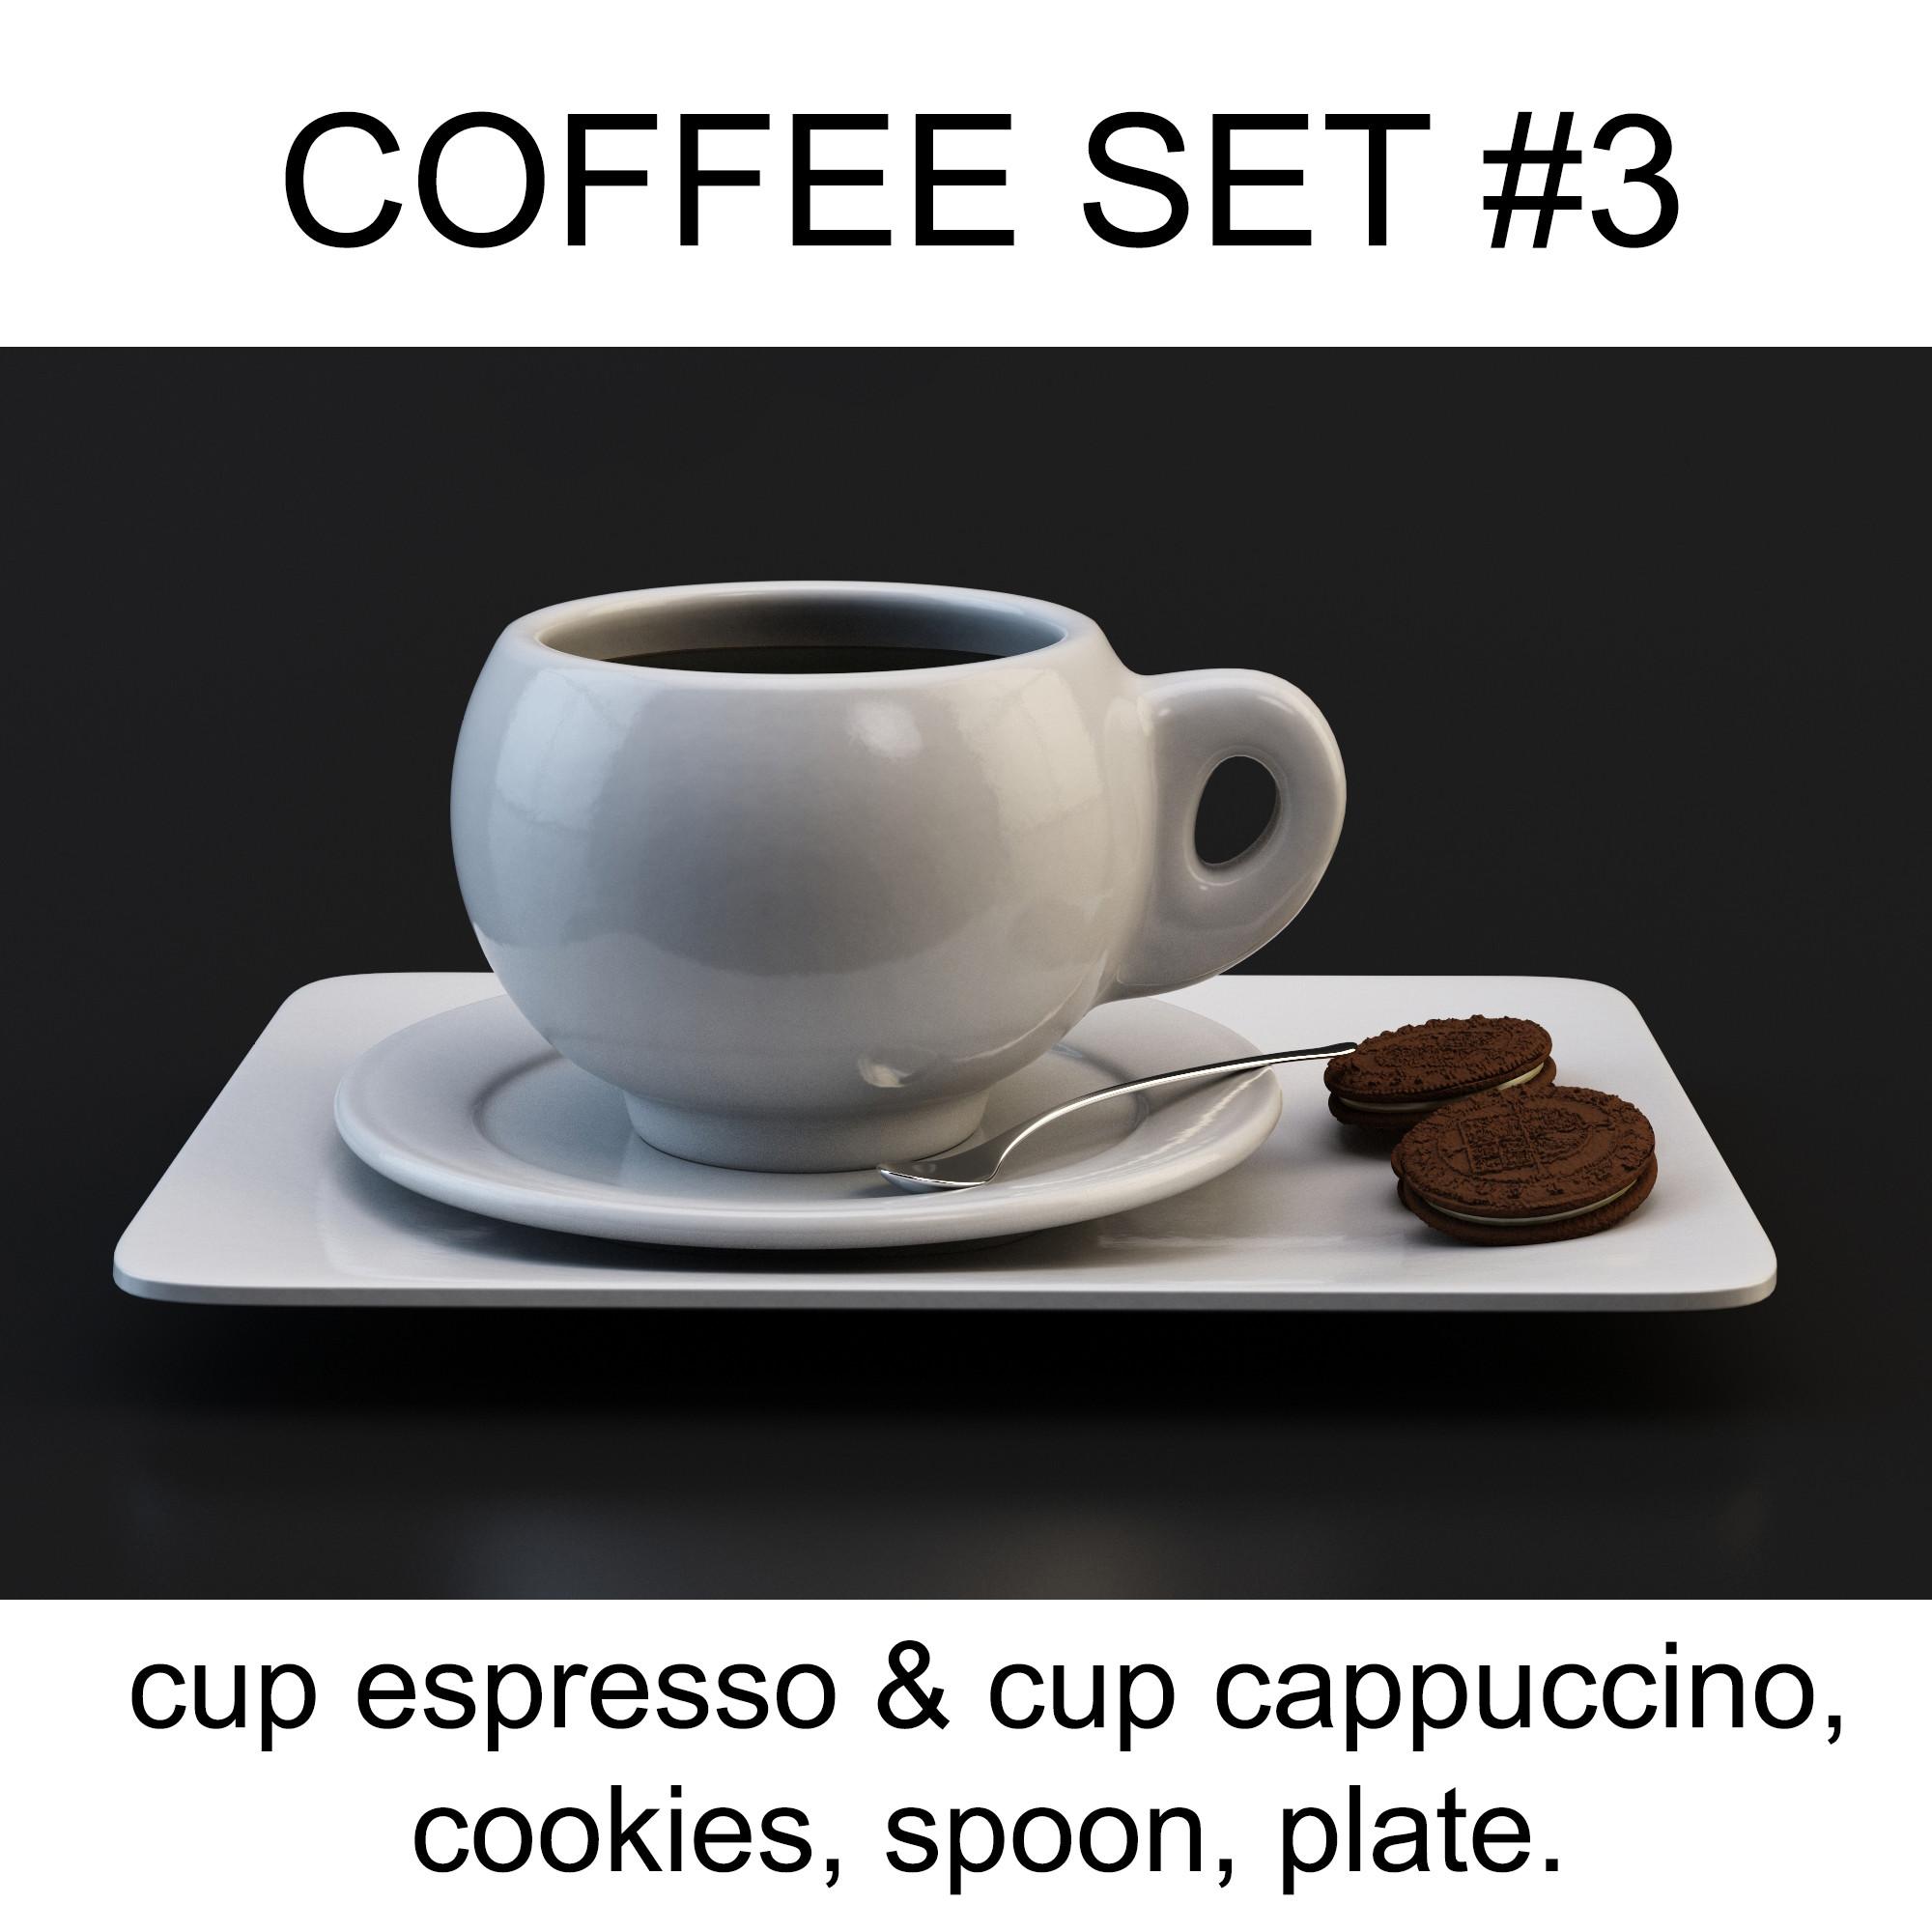 _C3D_Coffee#3.jpg